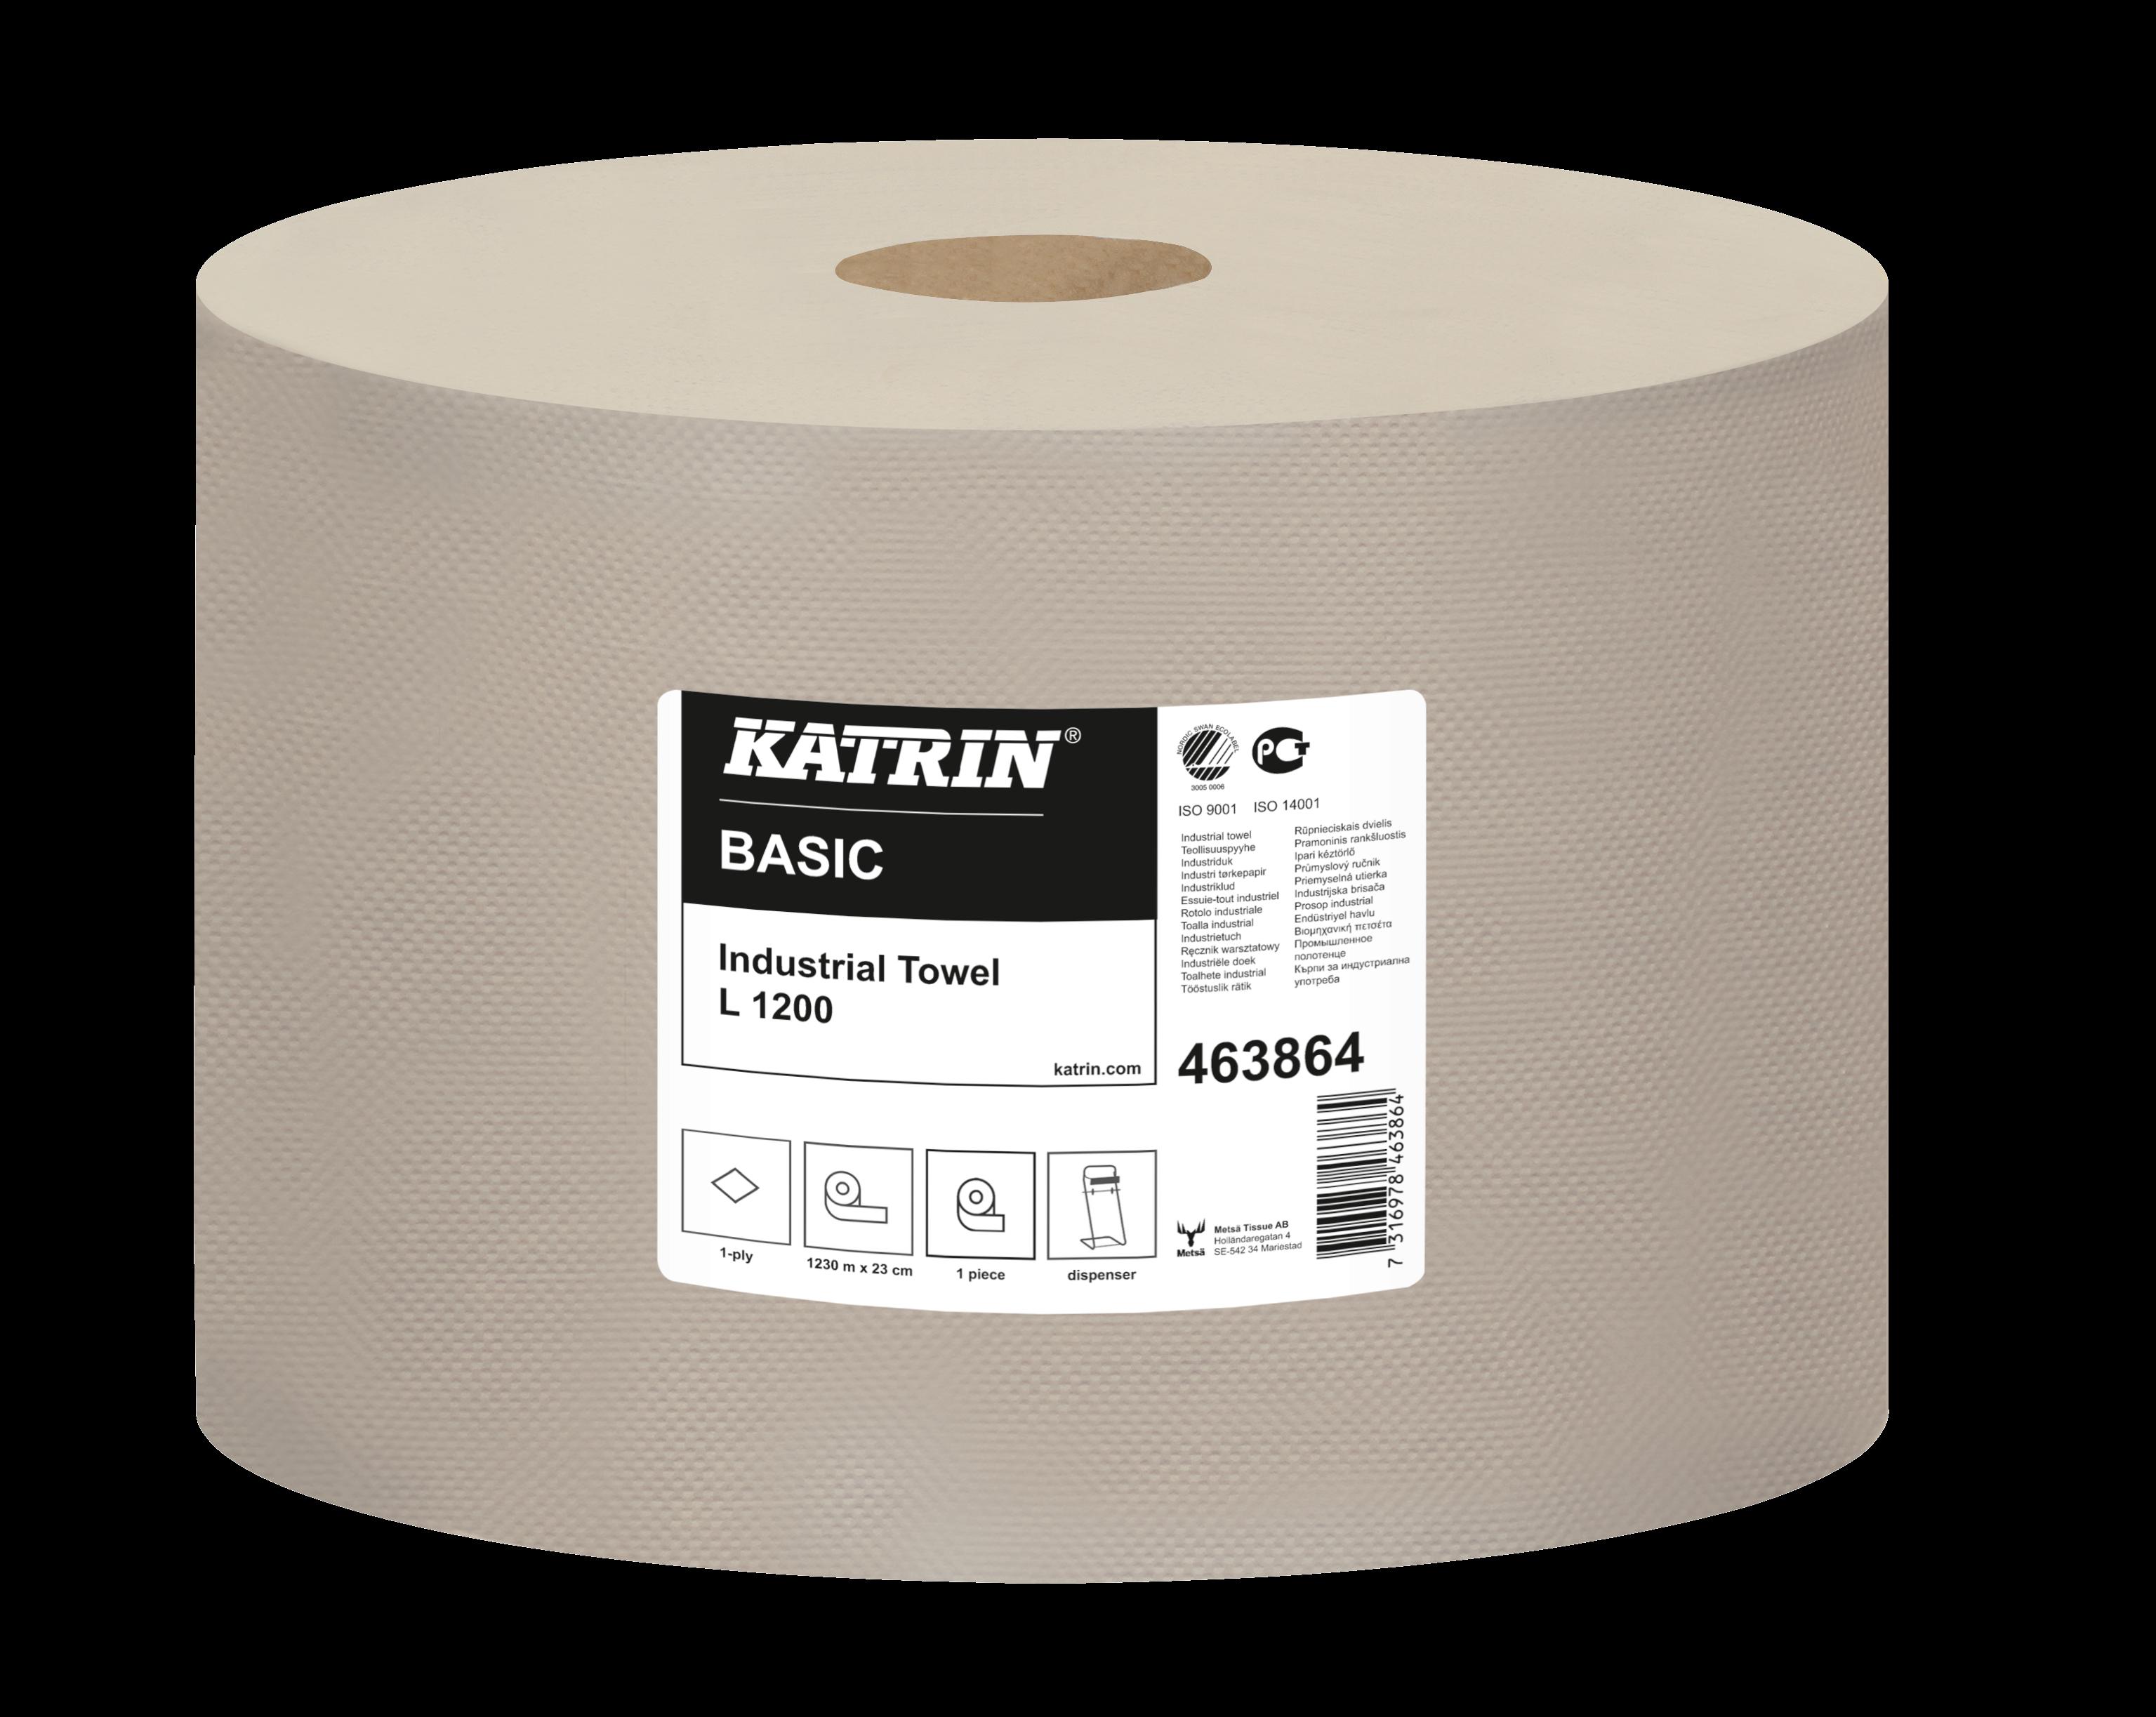 Katrin Basic Industrial Towel L 1200